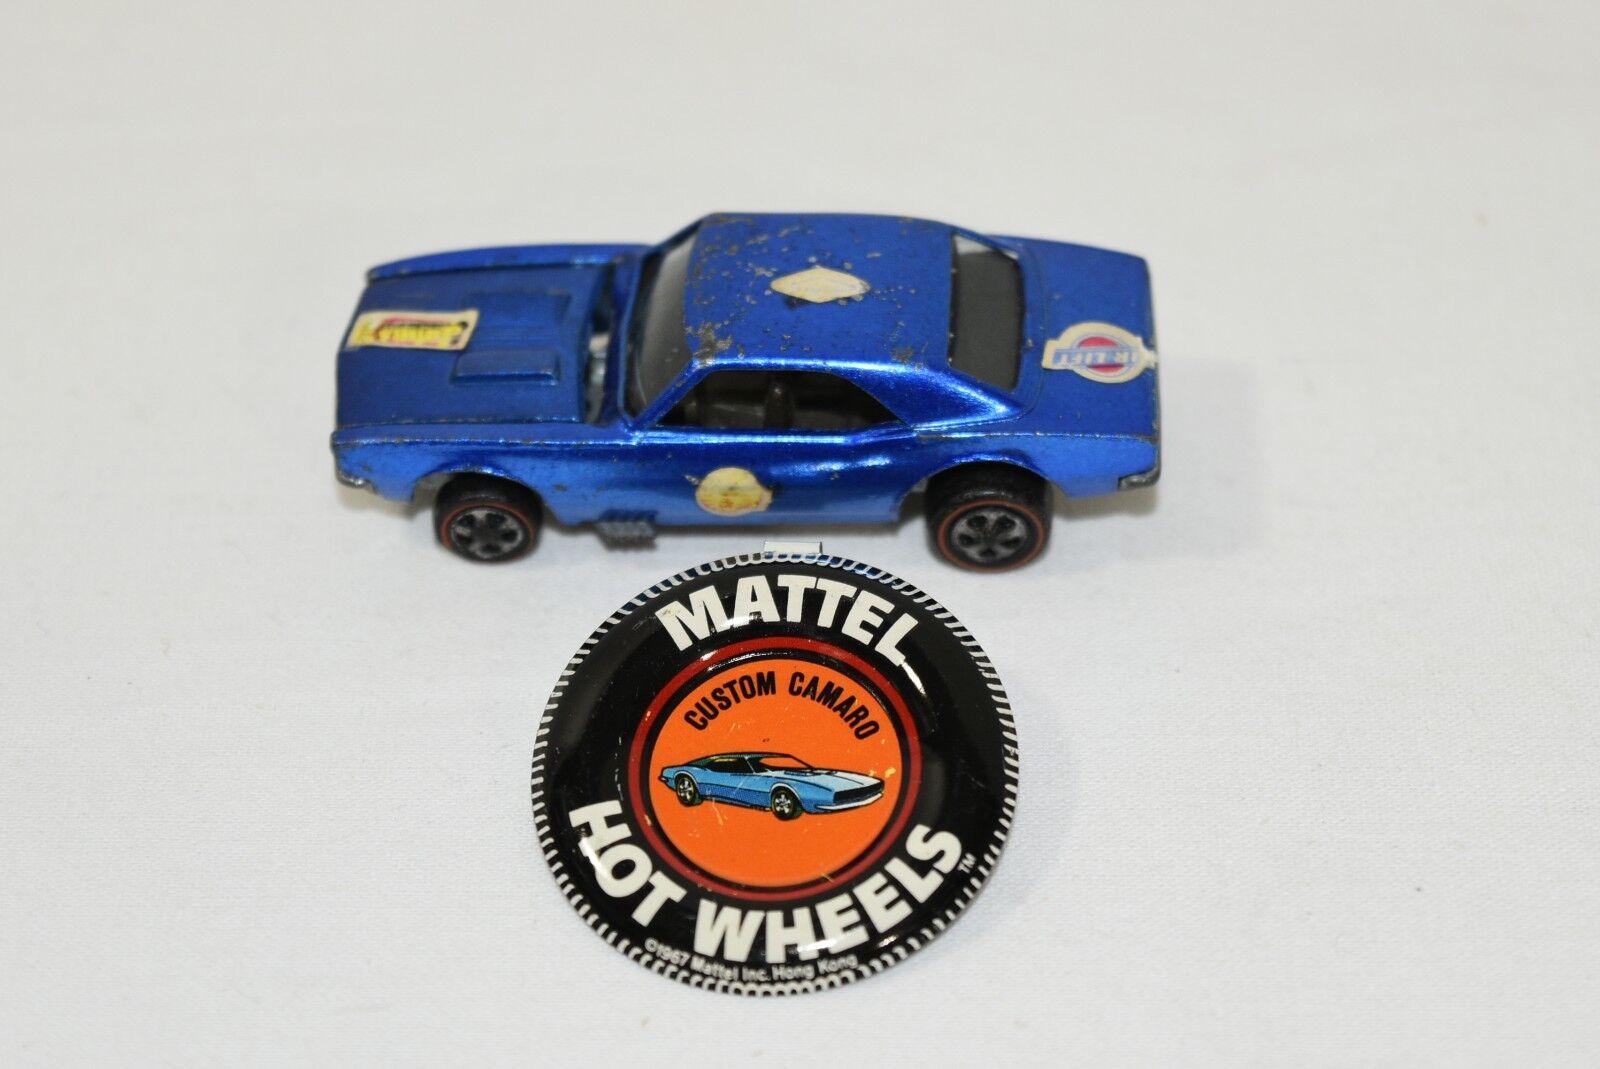 Original 1967 Hot Wheels rossoline Custom Camaro blu with dark Internal + Button